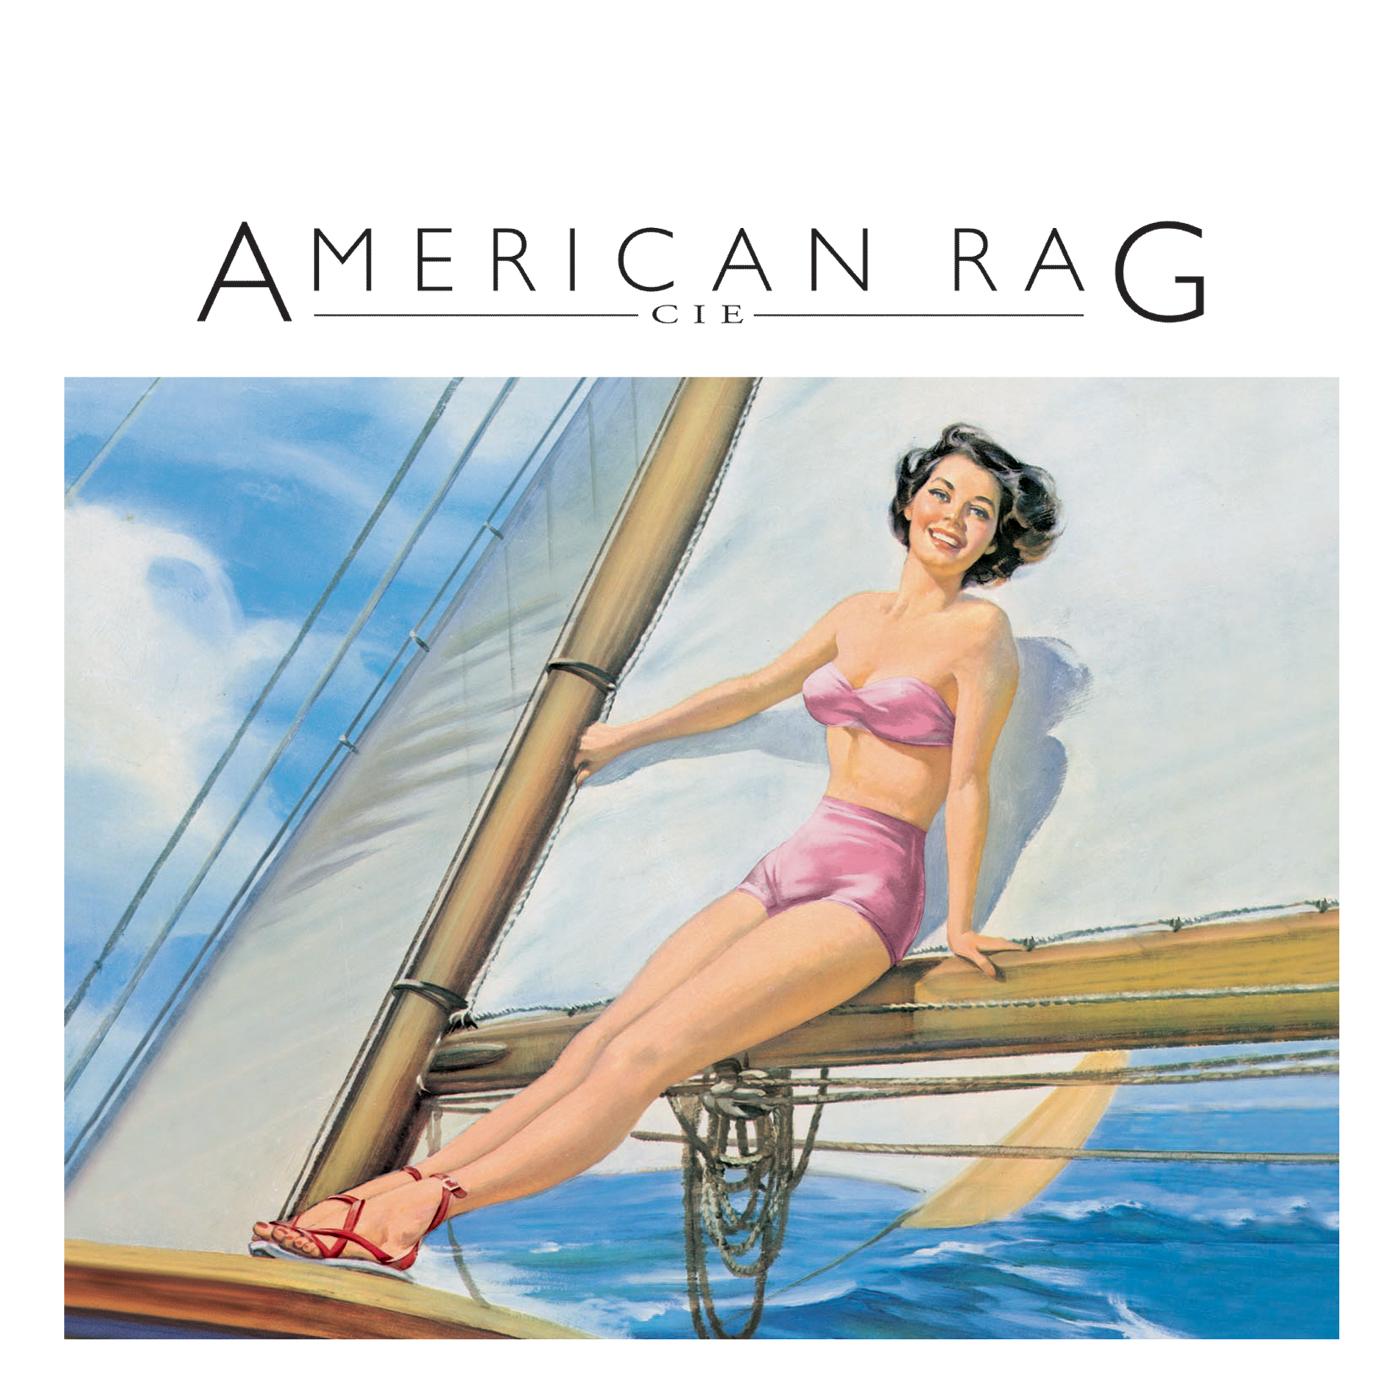 AmericanRag_1.jpg